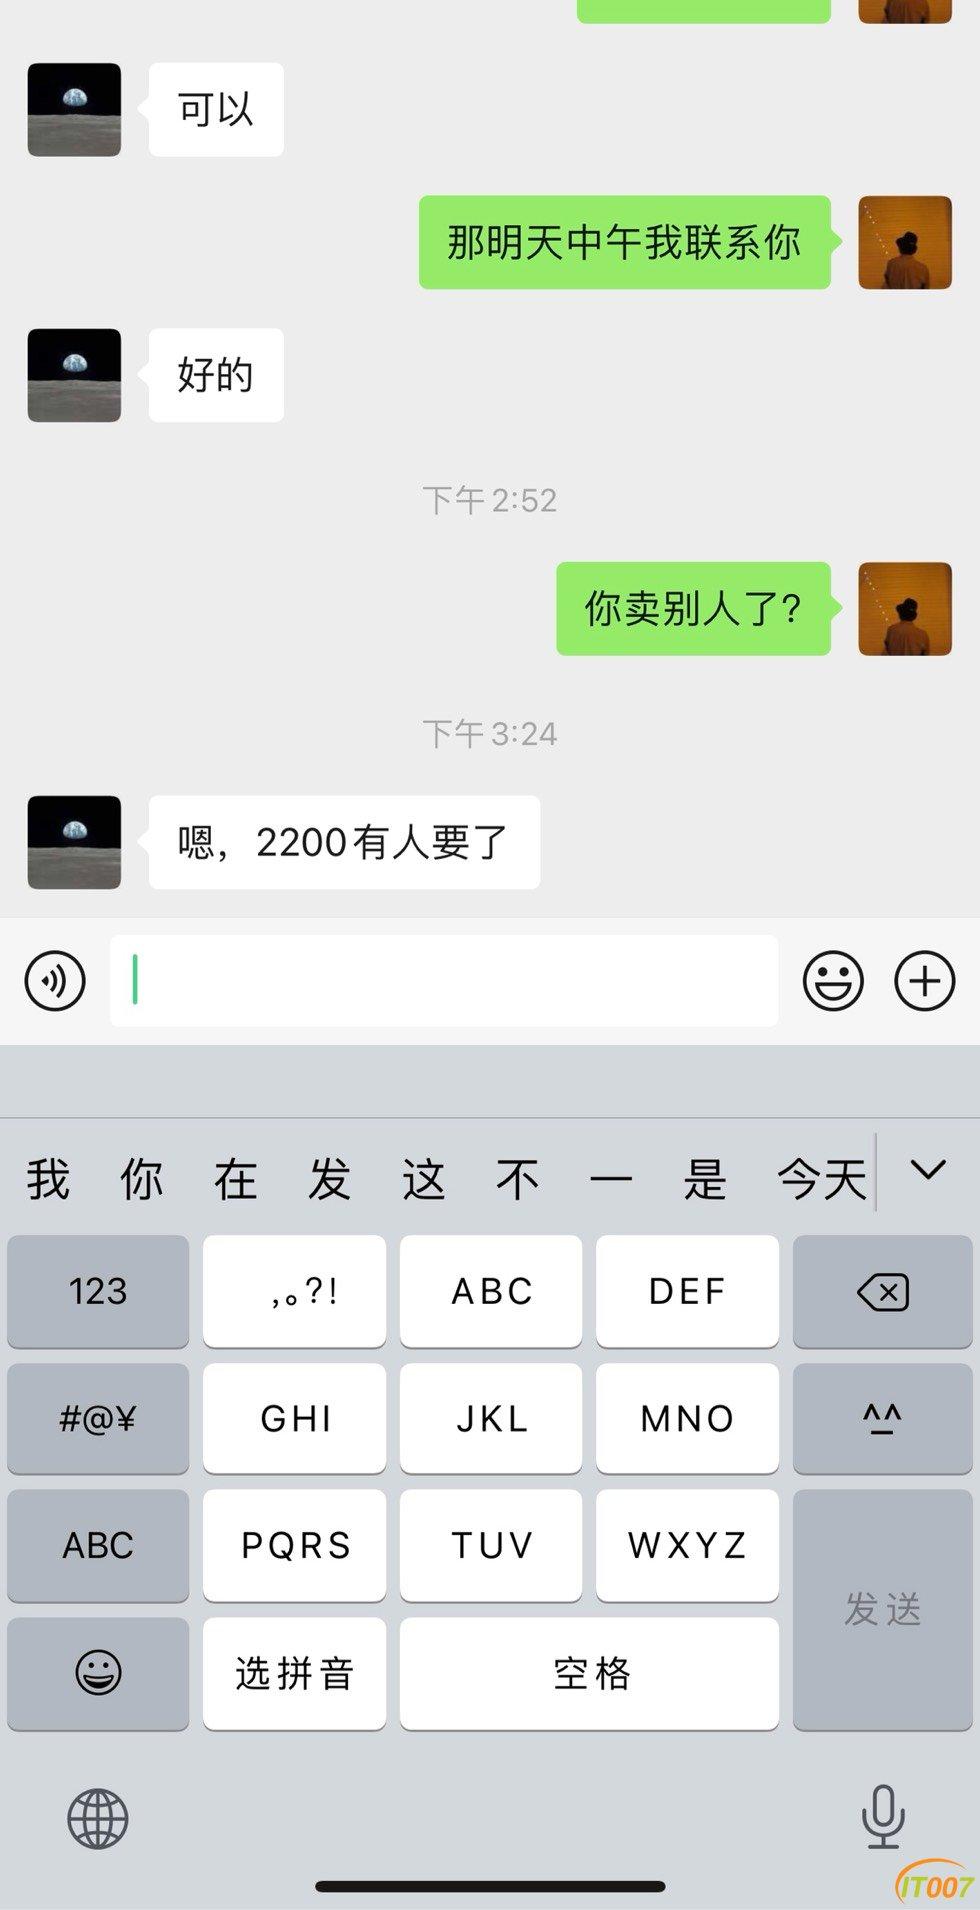 155356s144y19lgky3iyks.jpg